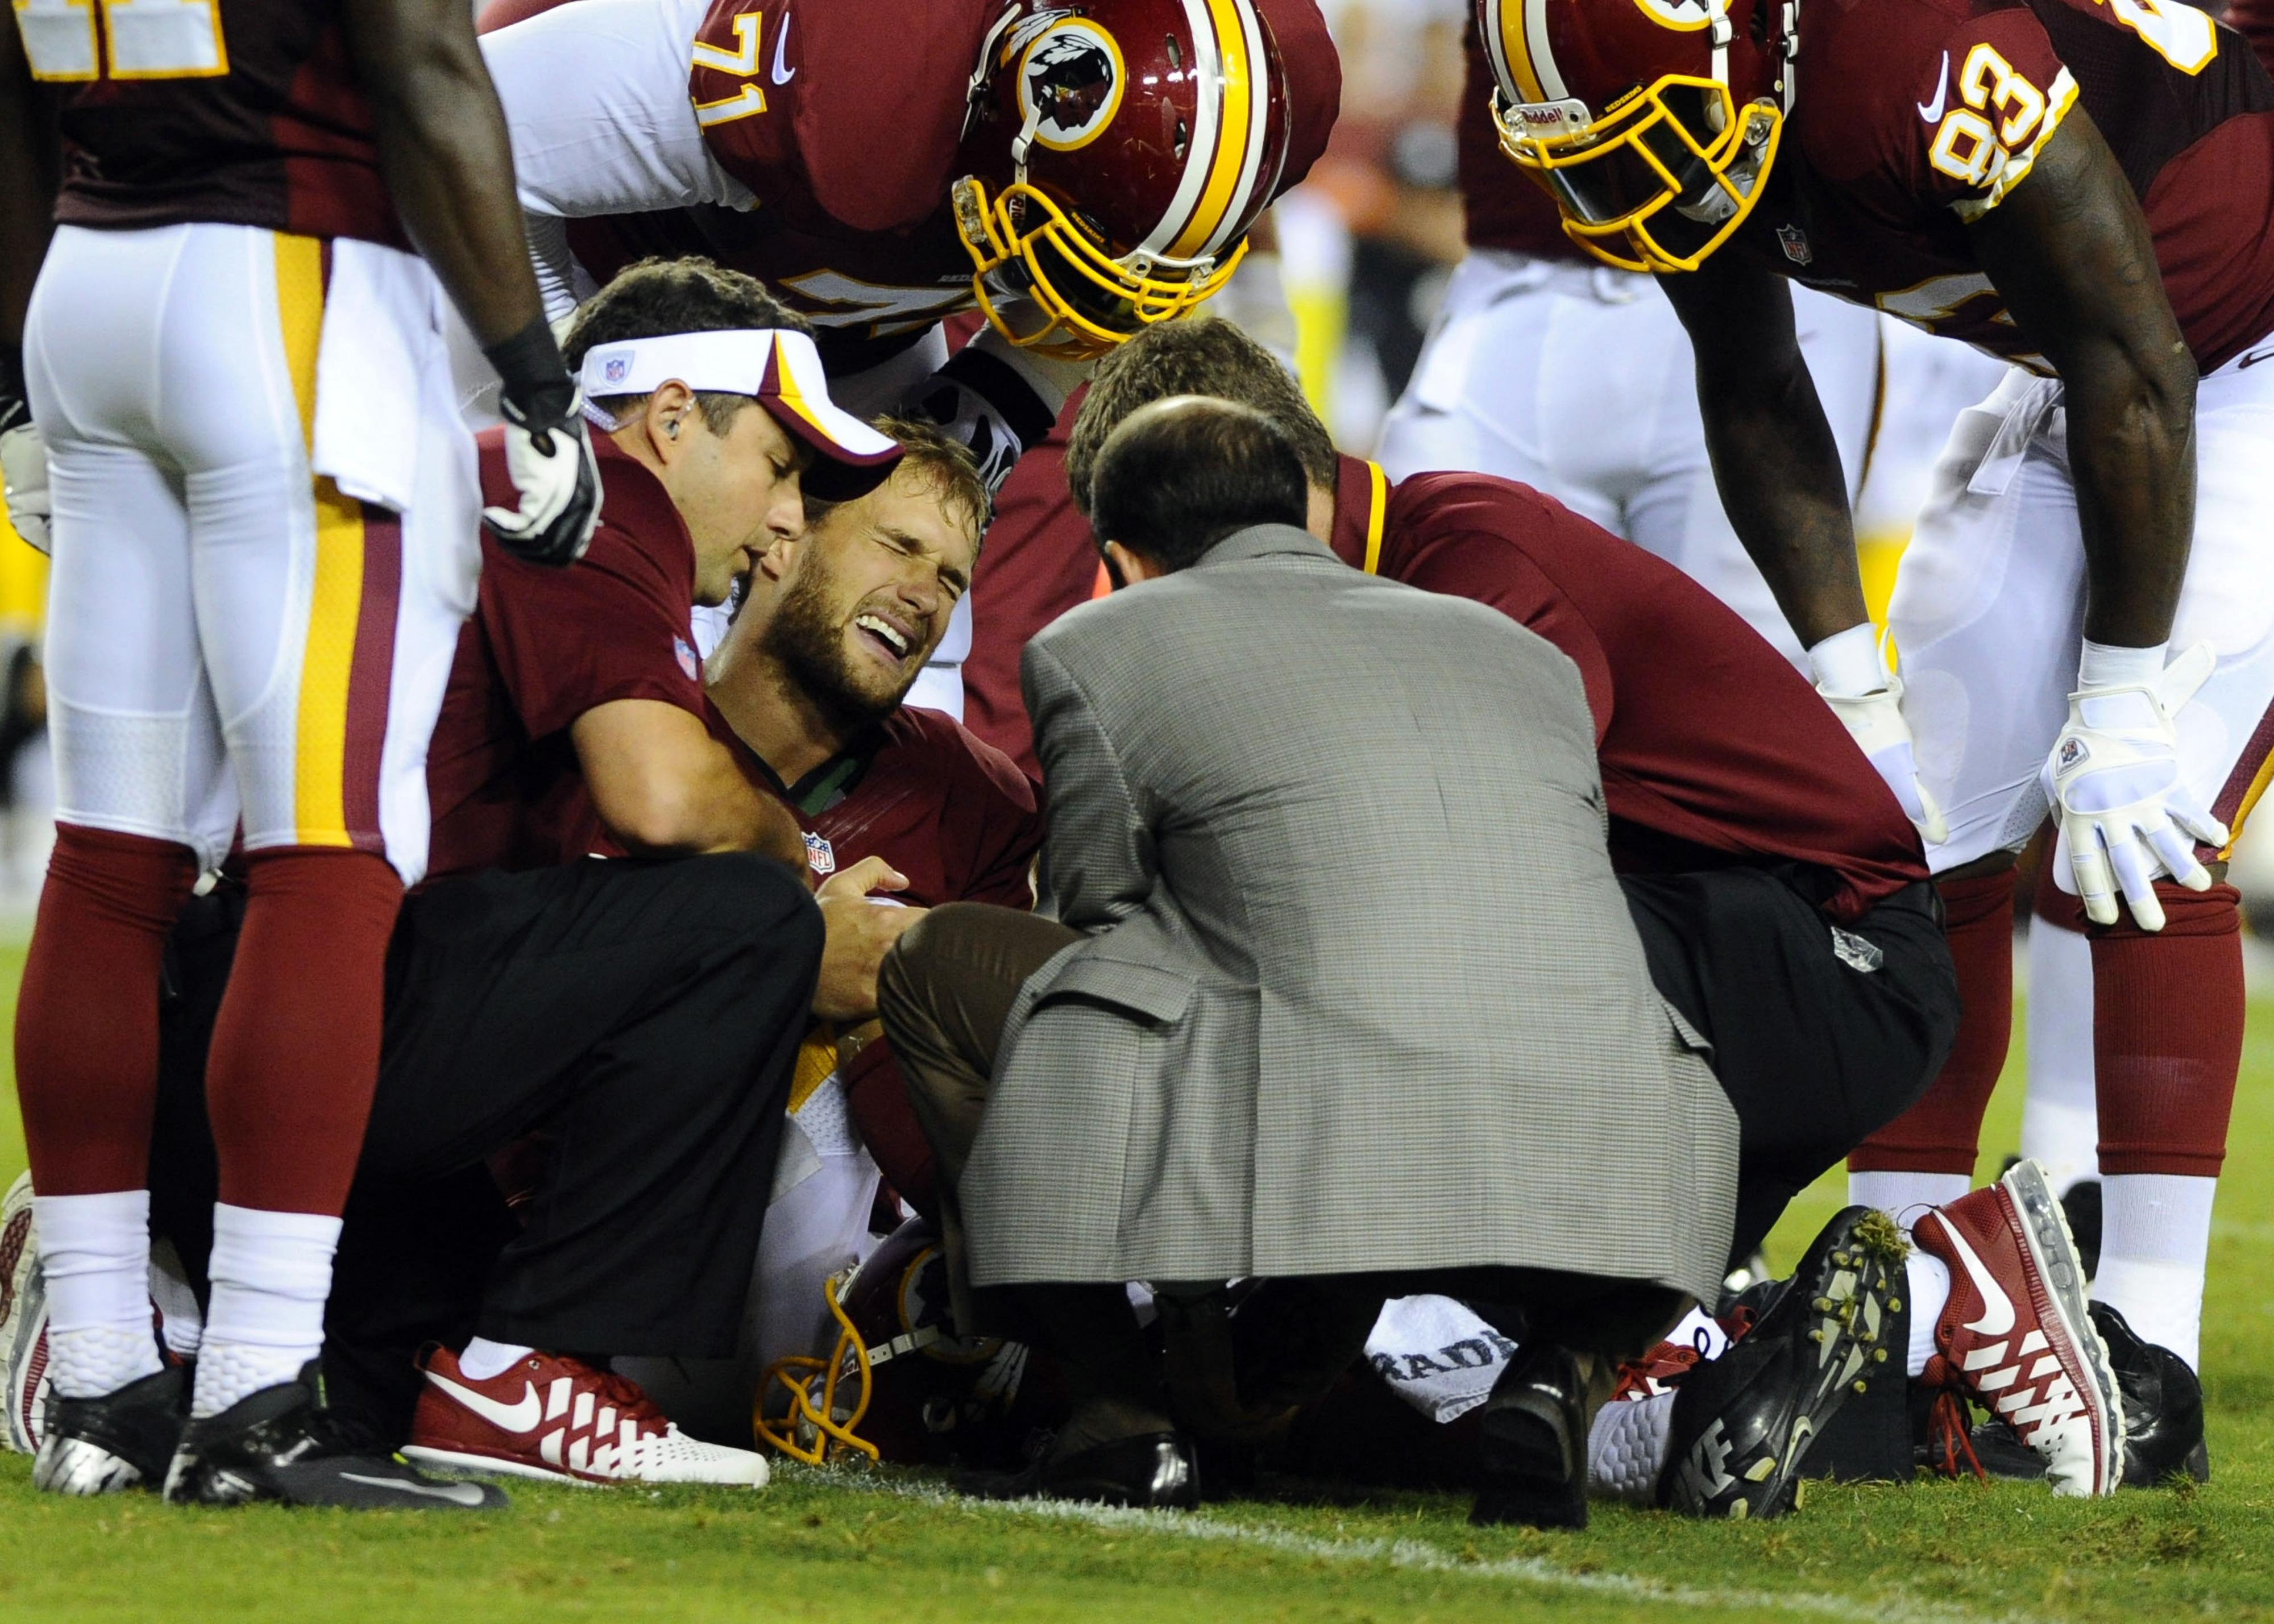 Steelers vs. Redskins final score: Washington wins but suffers 4 key injuries